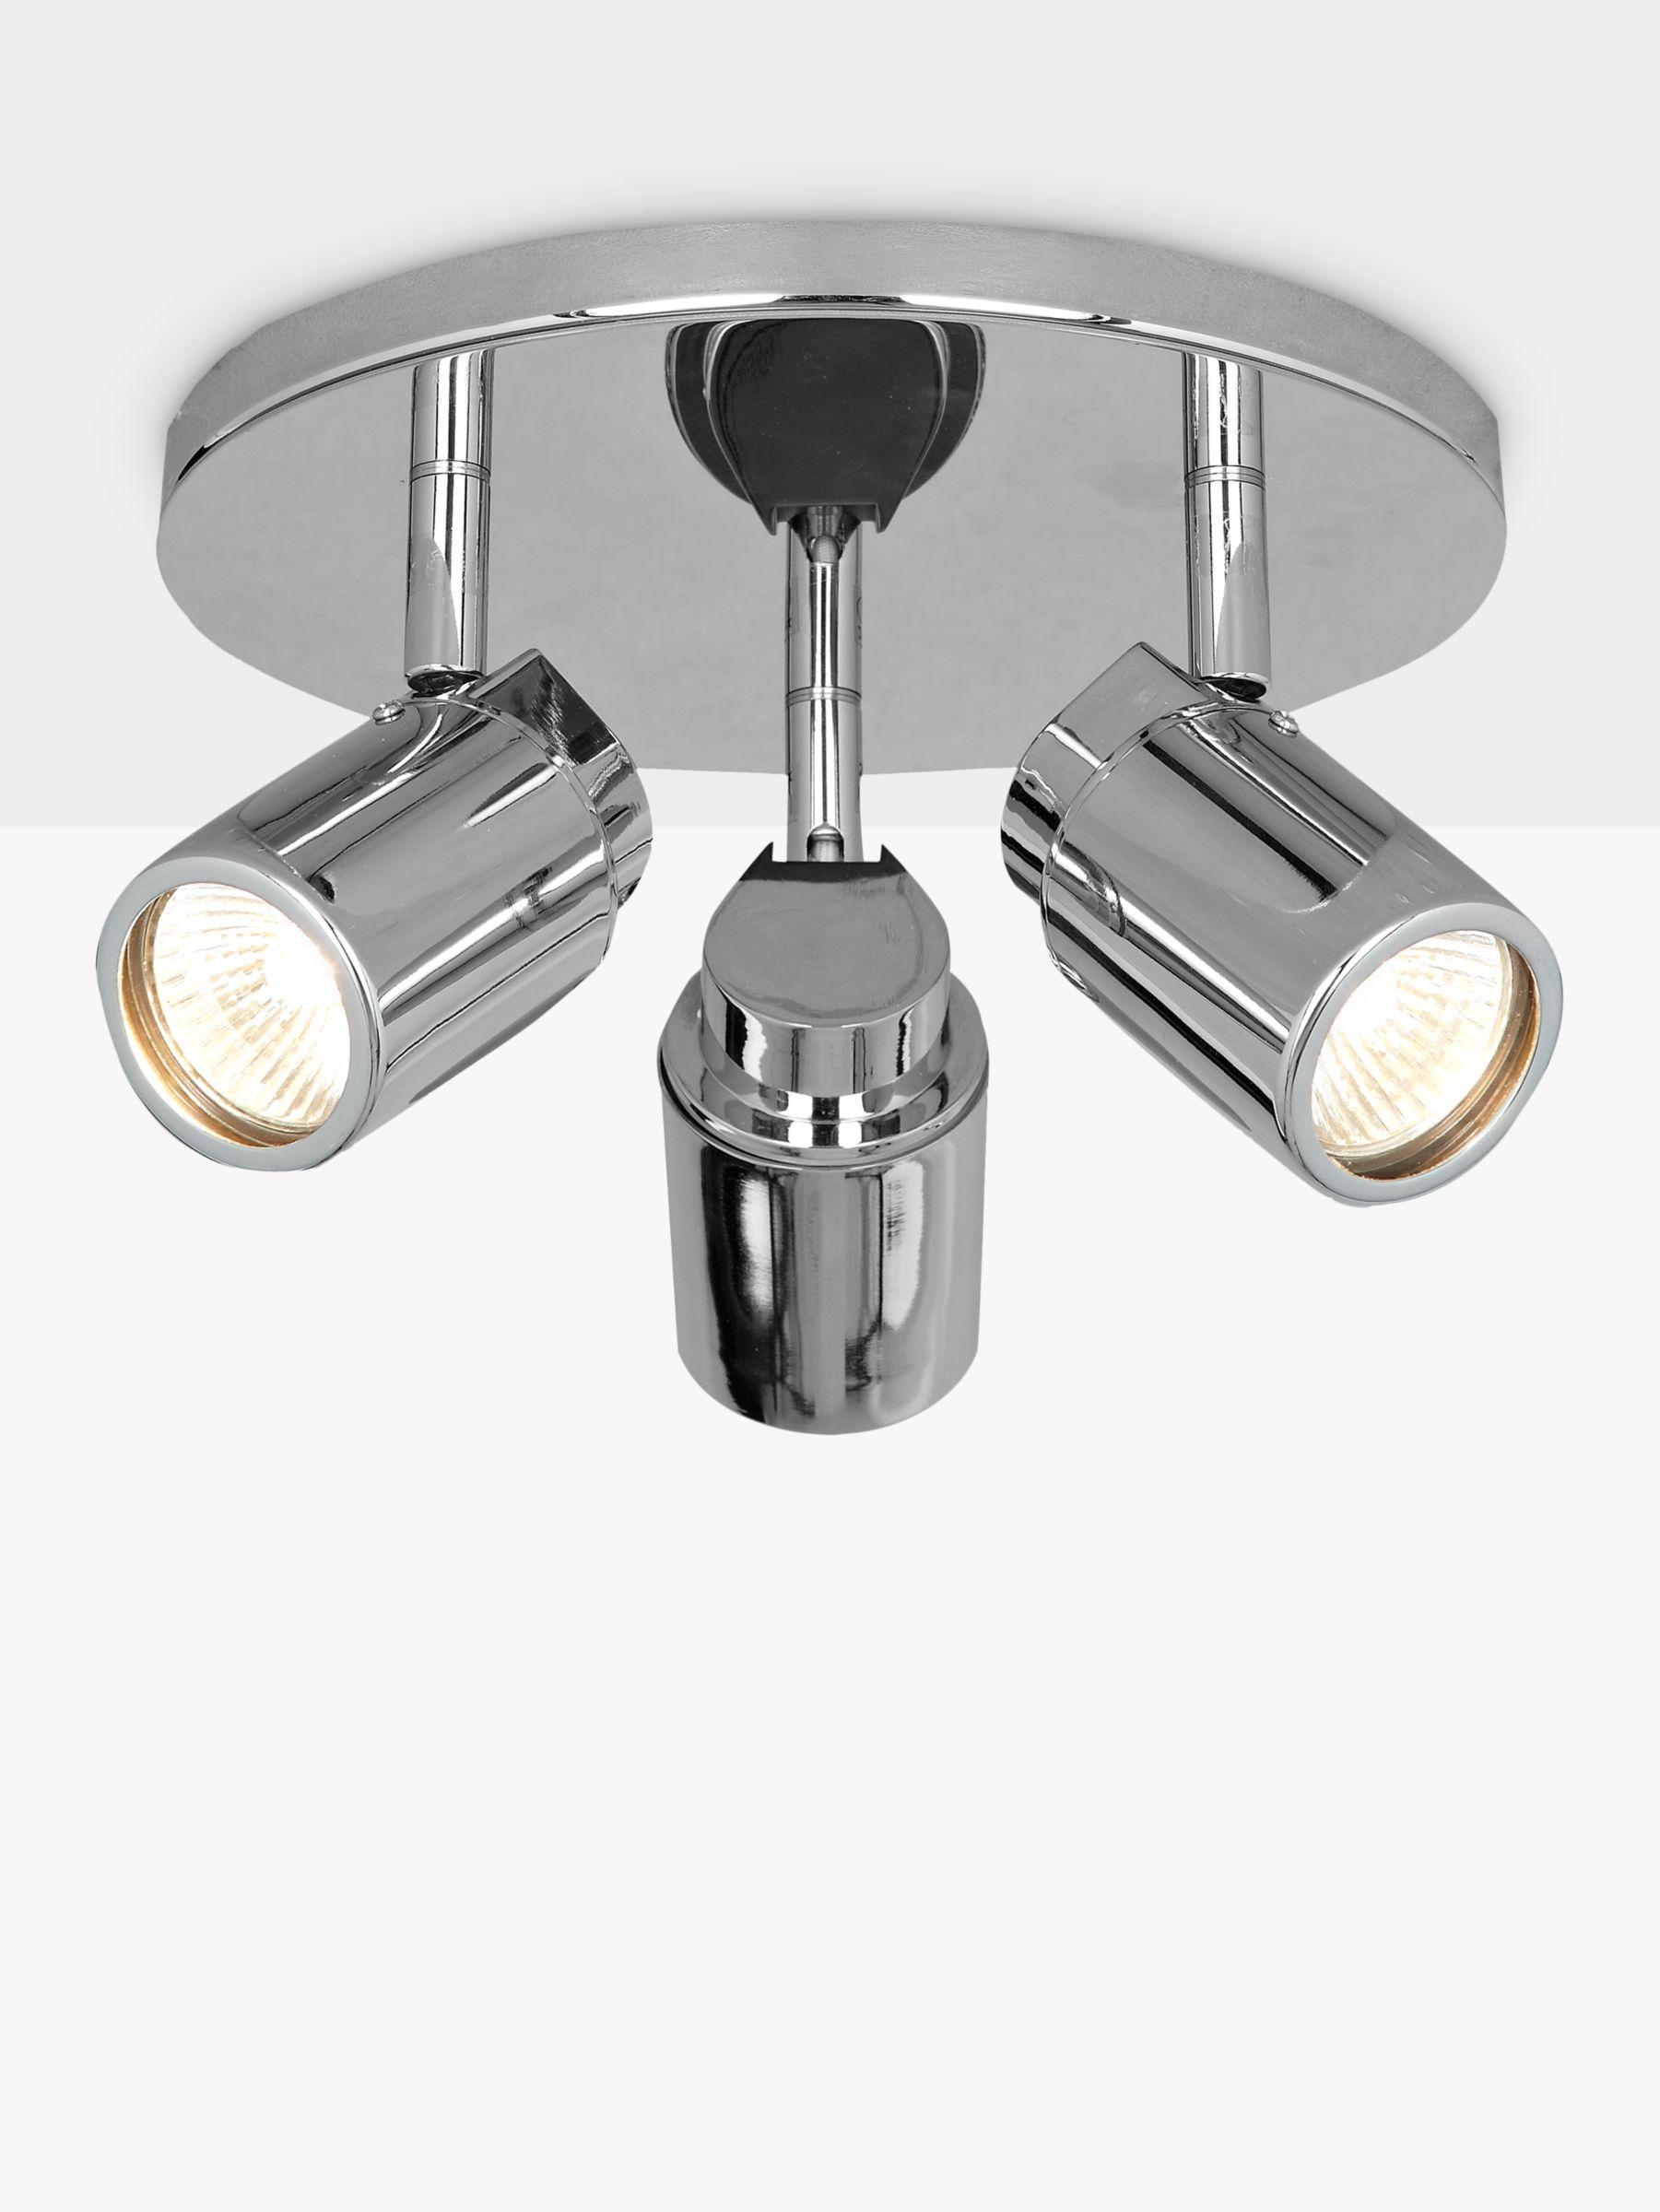 ASTRO Astro Como 3 Bathroom Spotlight Ceiling Plate